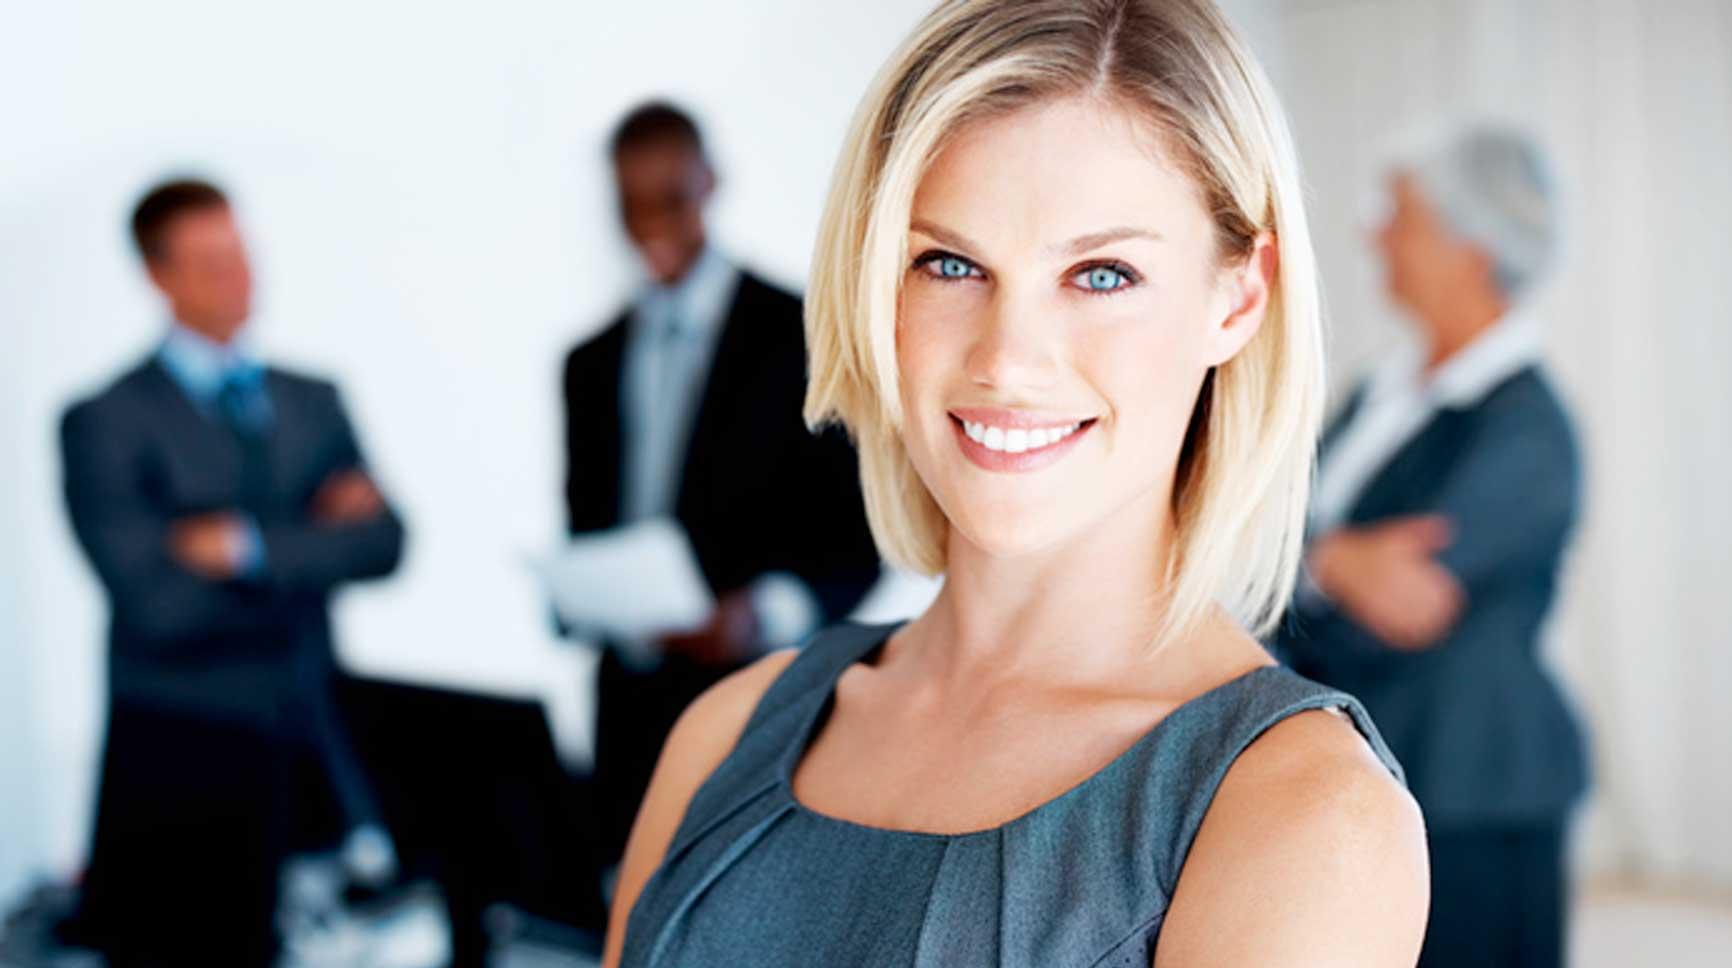 consultes sobre comunicació corporativa - consultas sobre comunicación corporativa